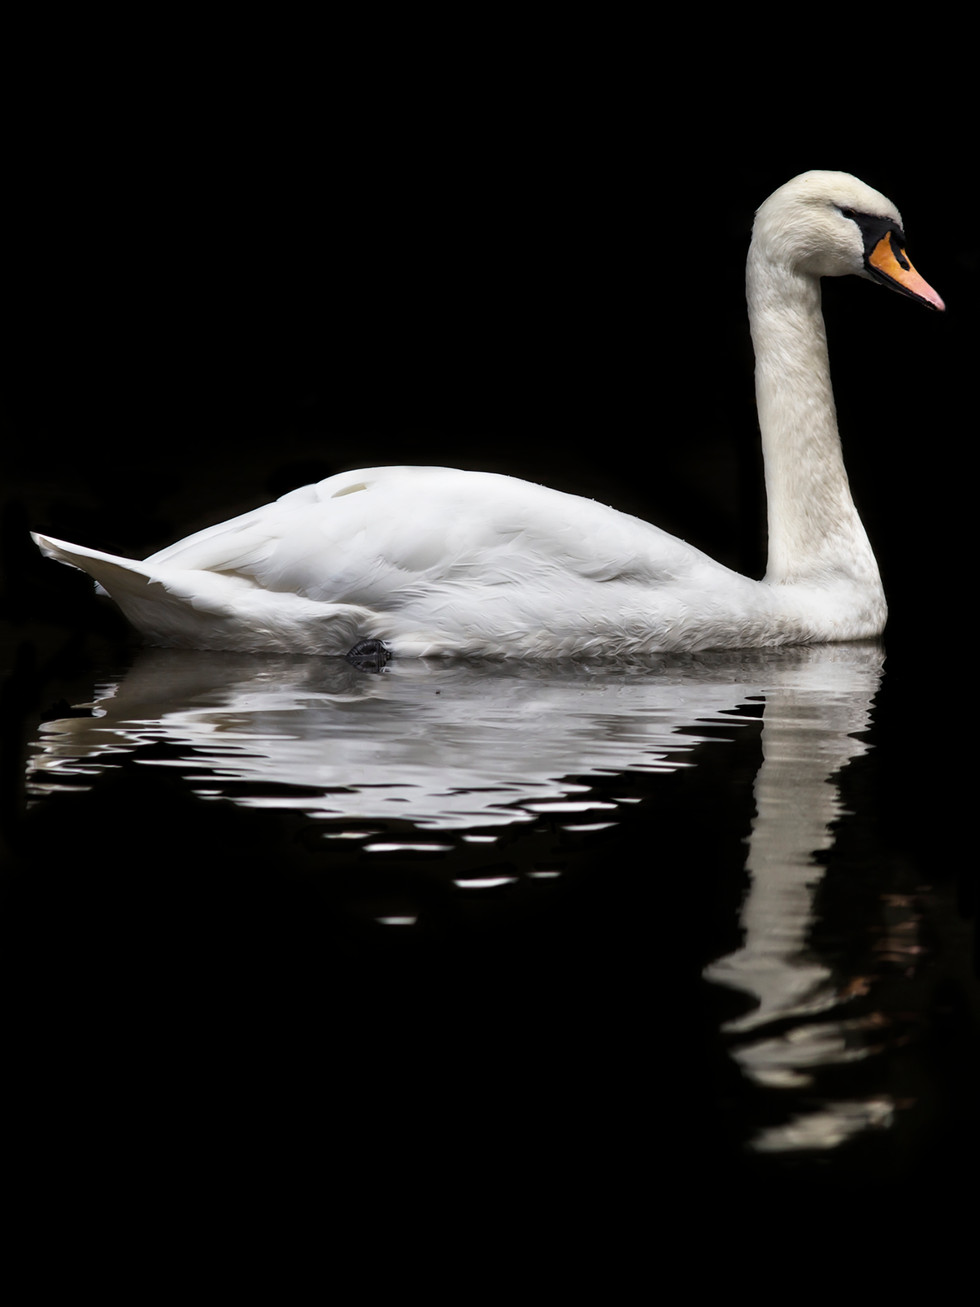 Mute Swan reflections